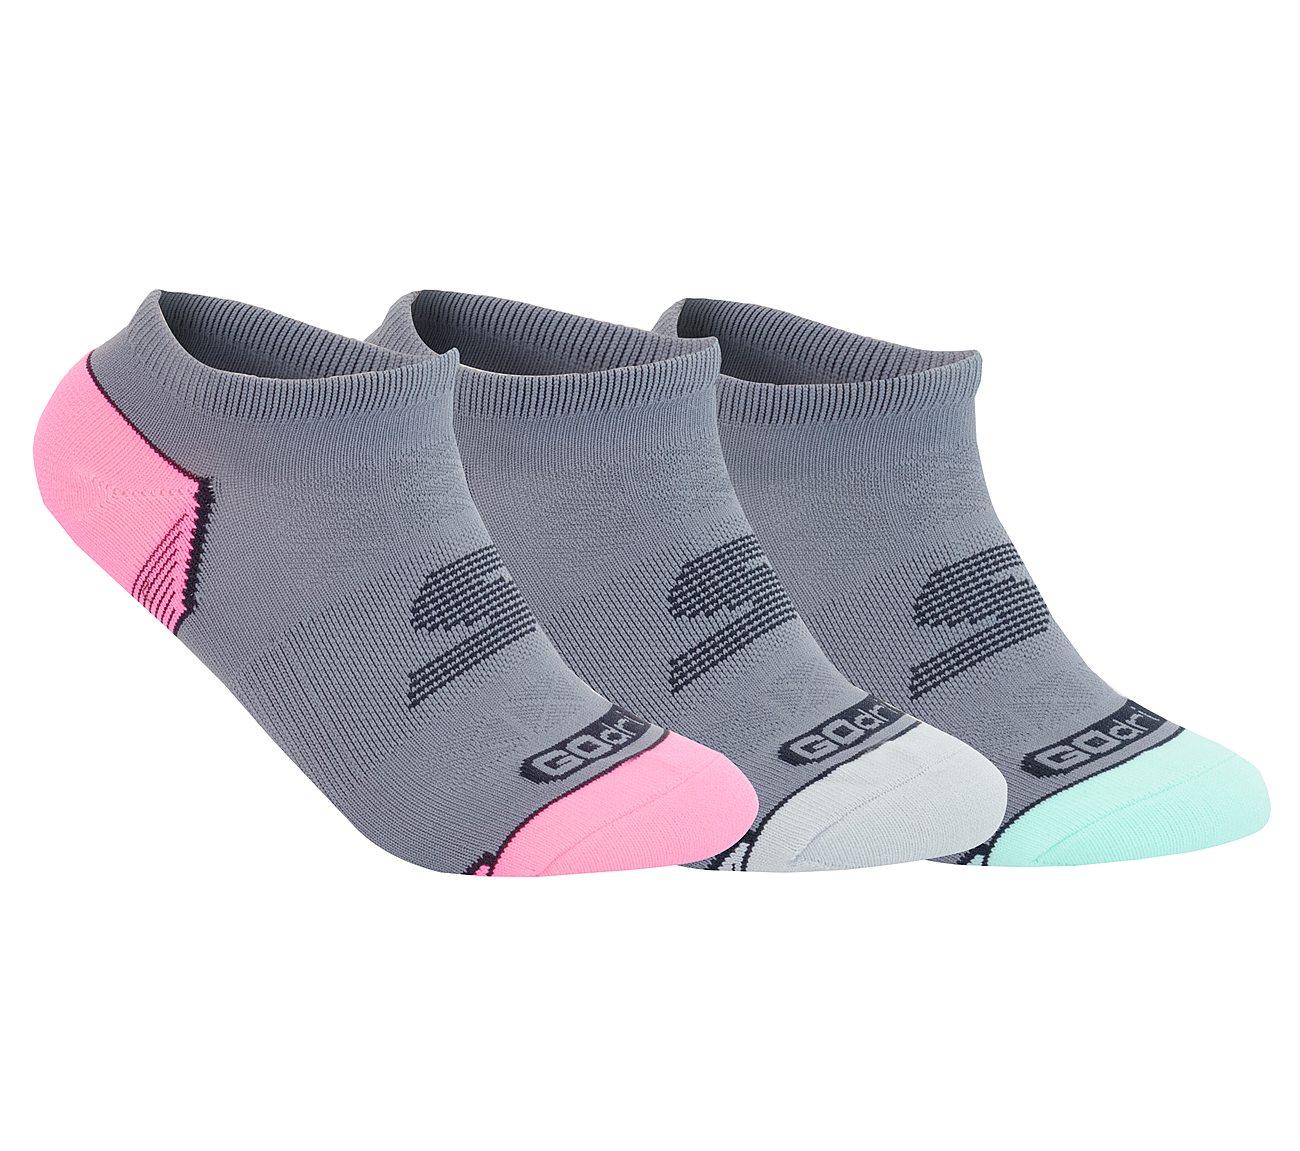 skechers socks